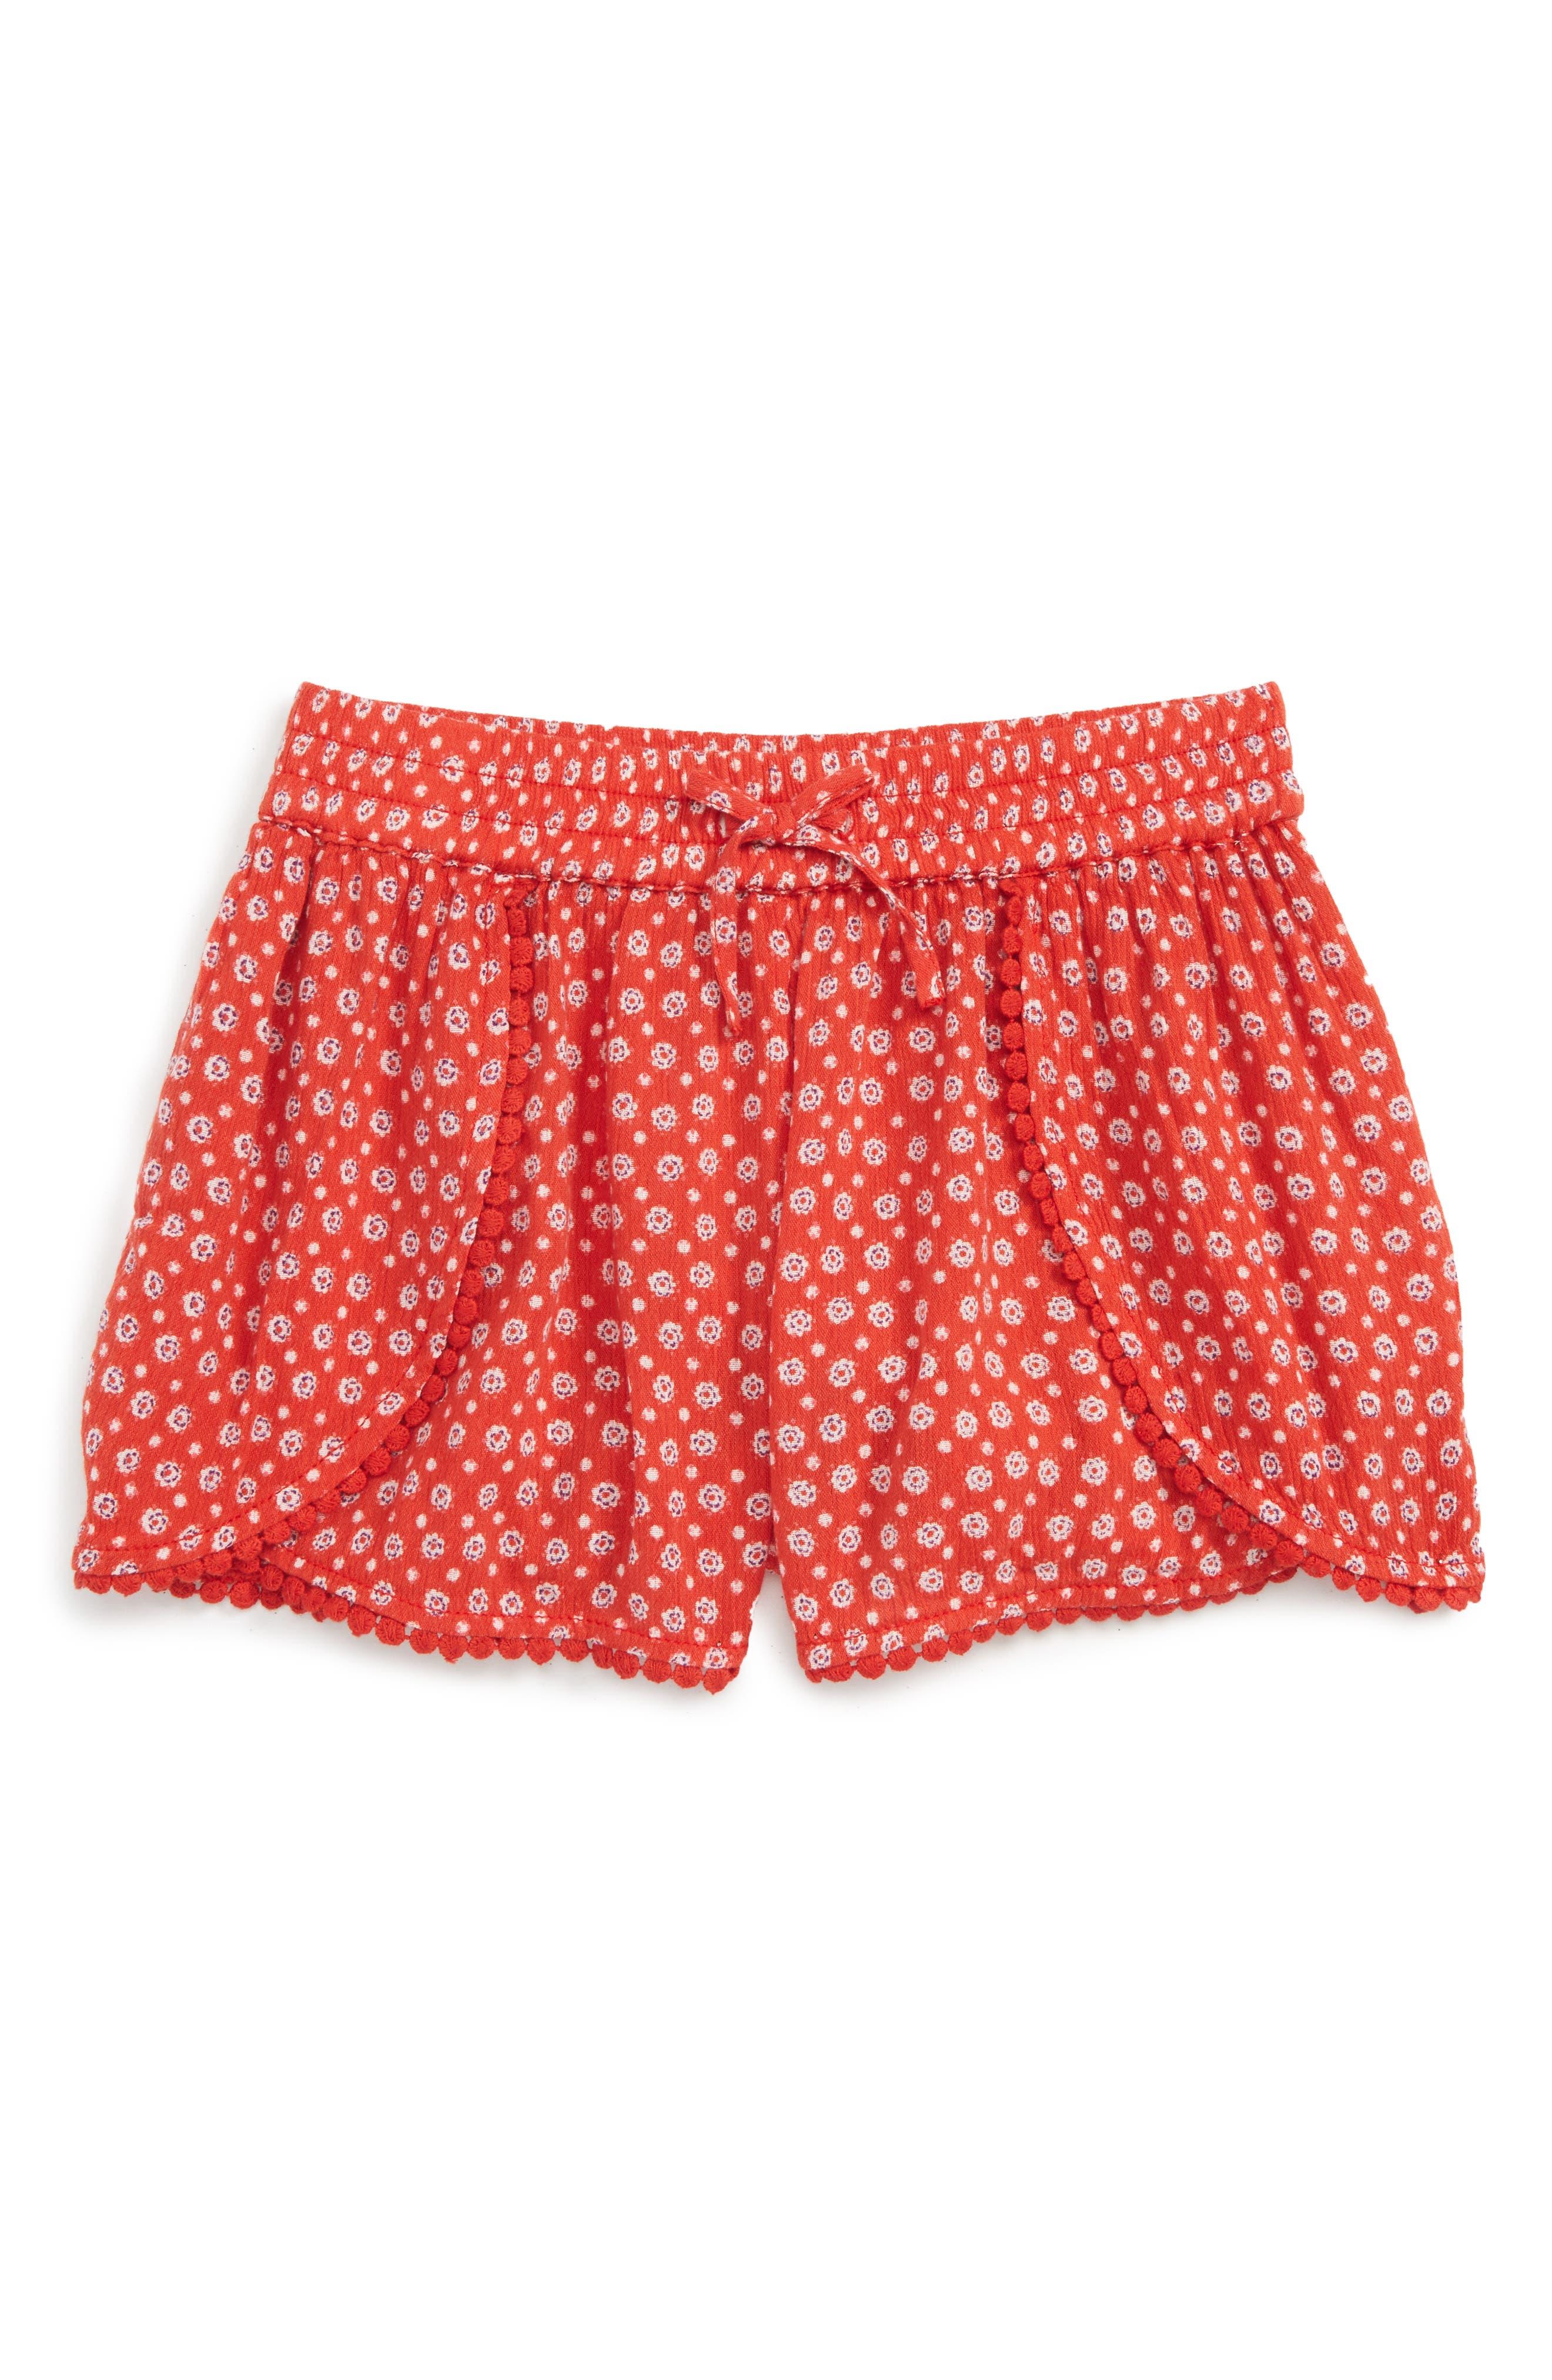 Print Shorts,                             Main thumbnail 1, color,                             Red Lava Spotty Floral